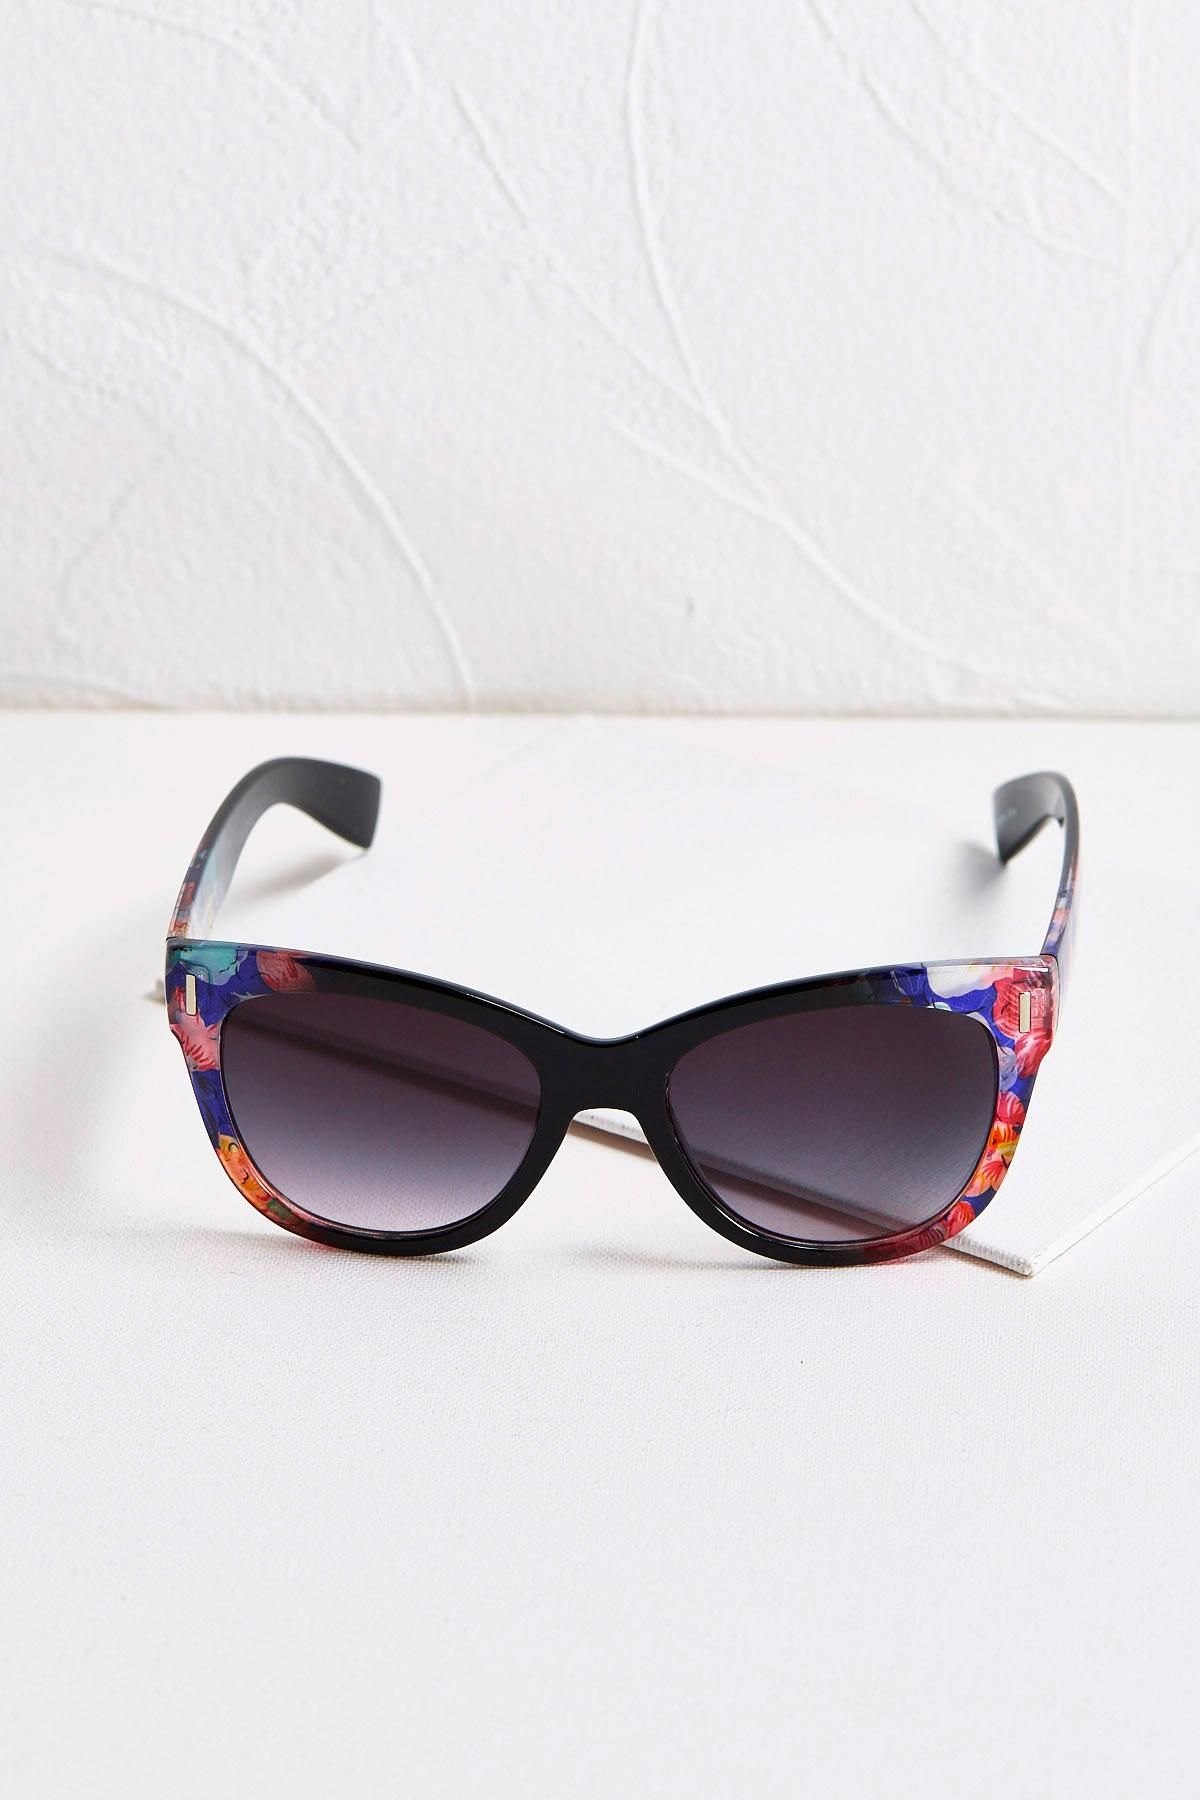 Violet Floral Sunglasses